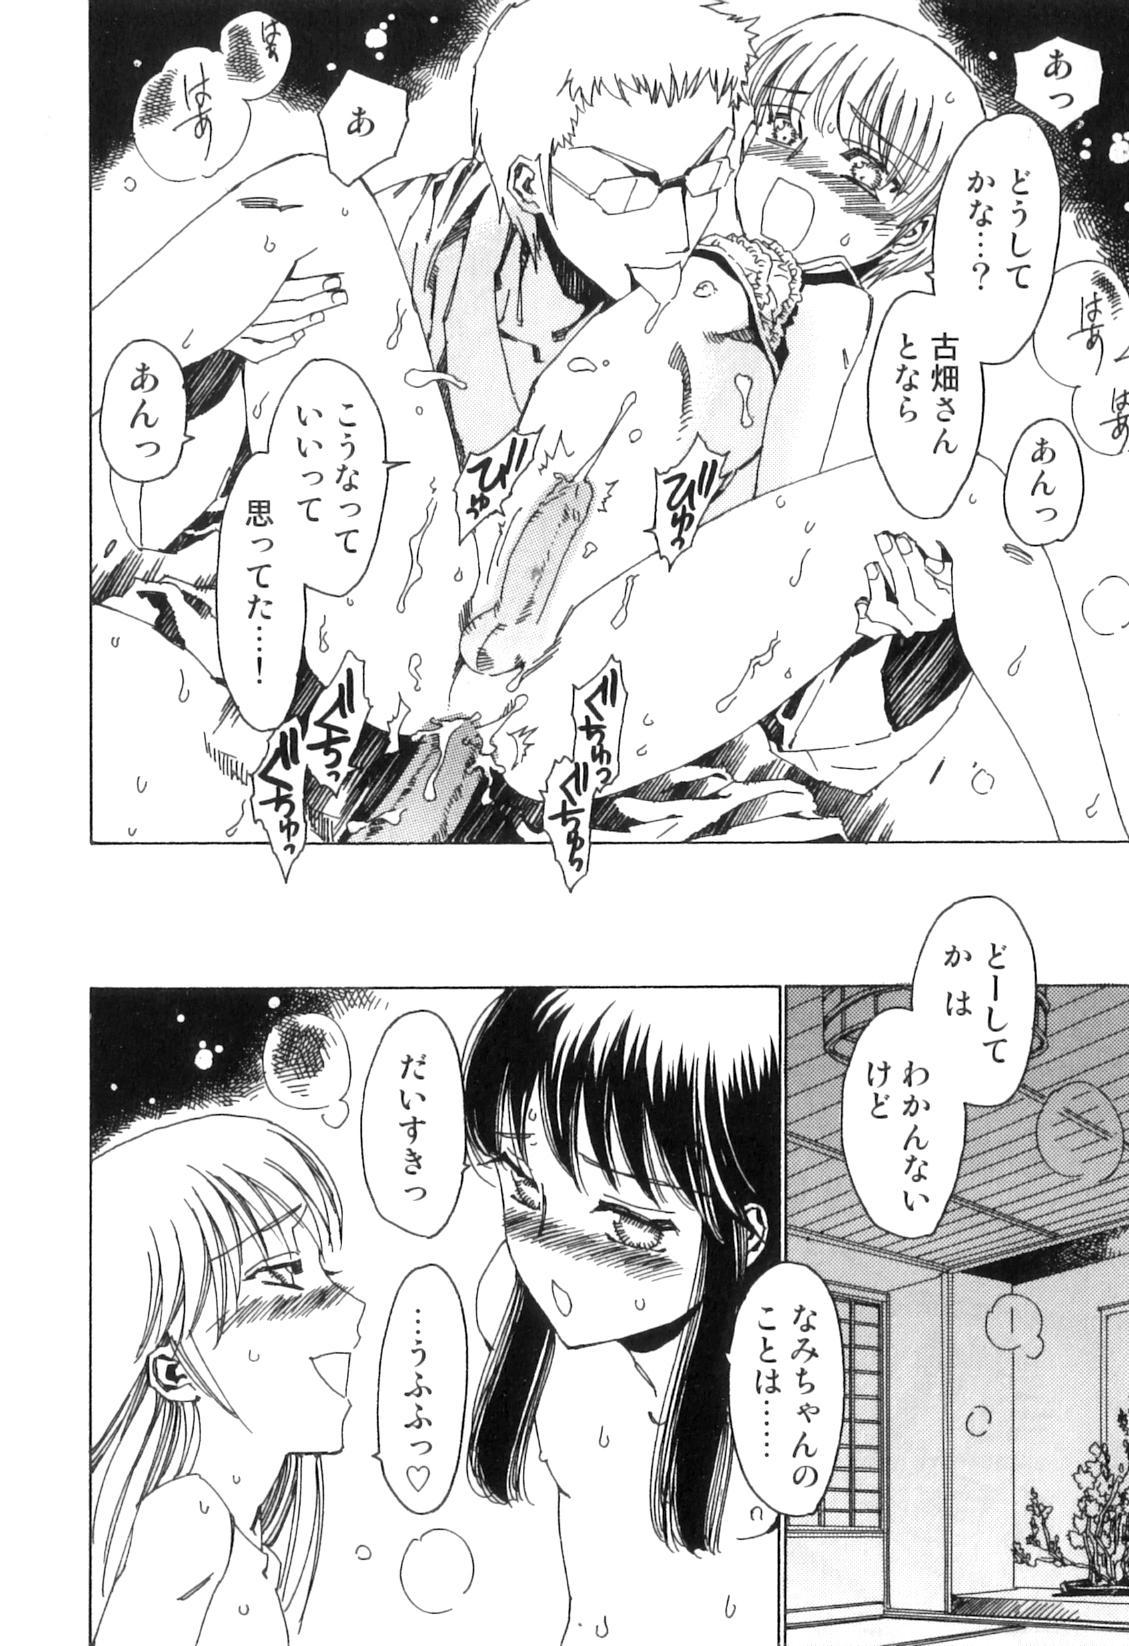 Yuni-Hapi 64